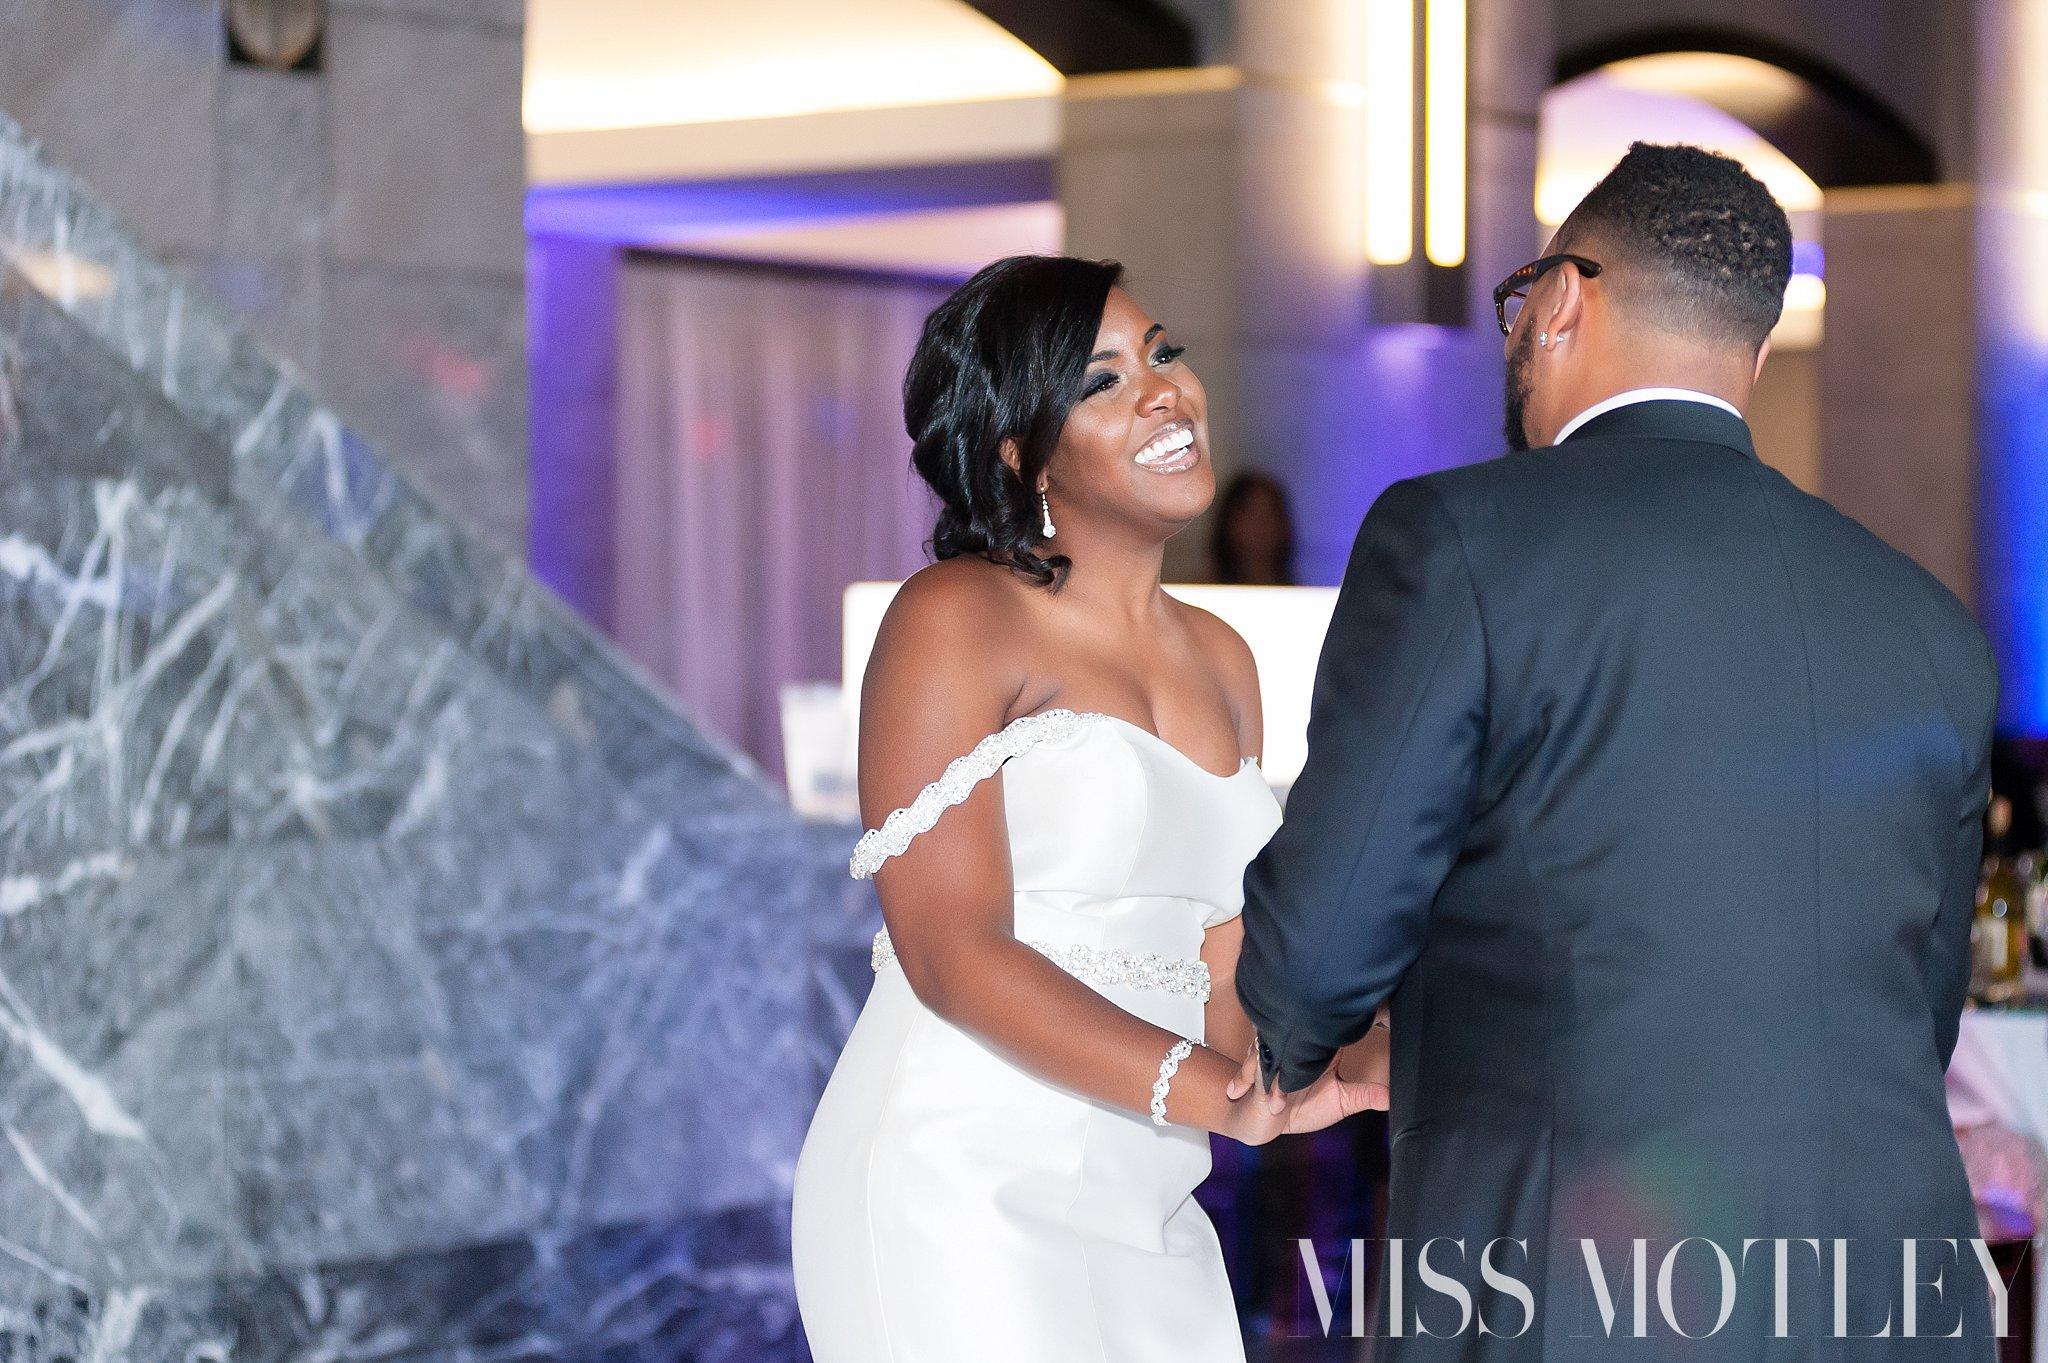 Chicago_wedding_photography_0526.jpg